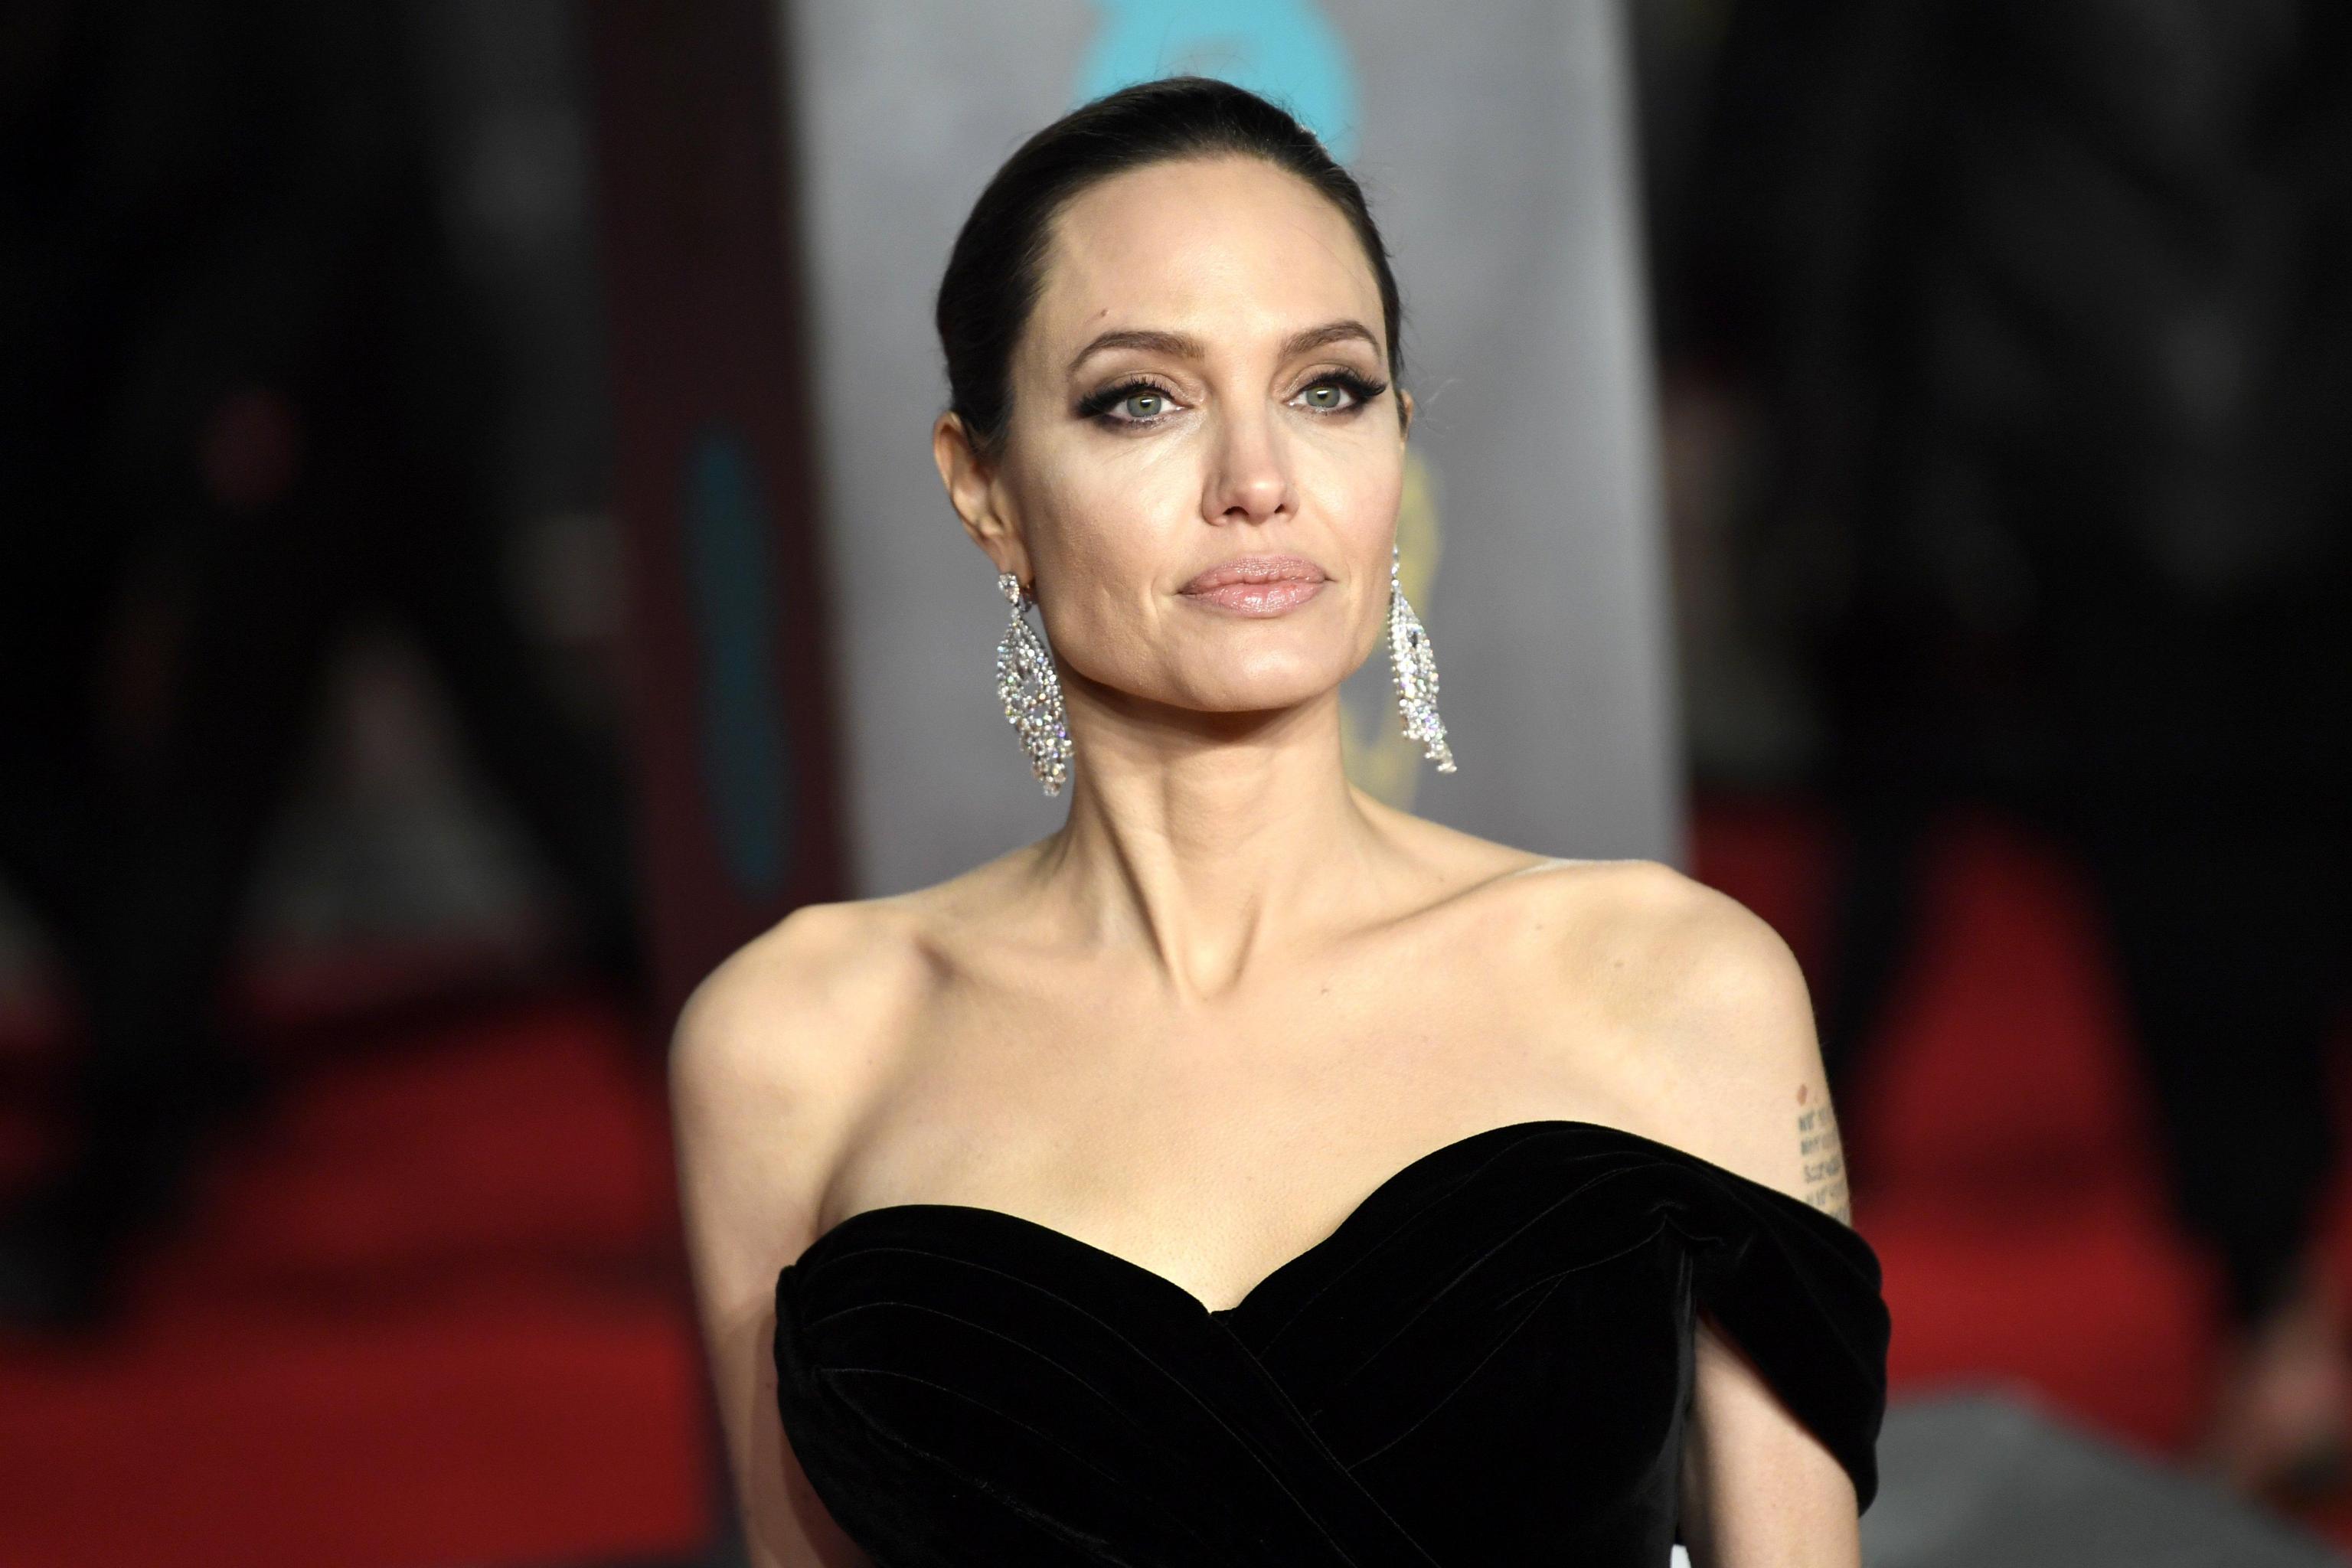 Dieta vegana: troppo pericolosa per Angelina Jolie